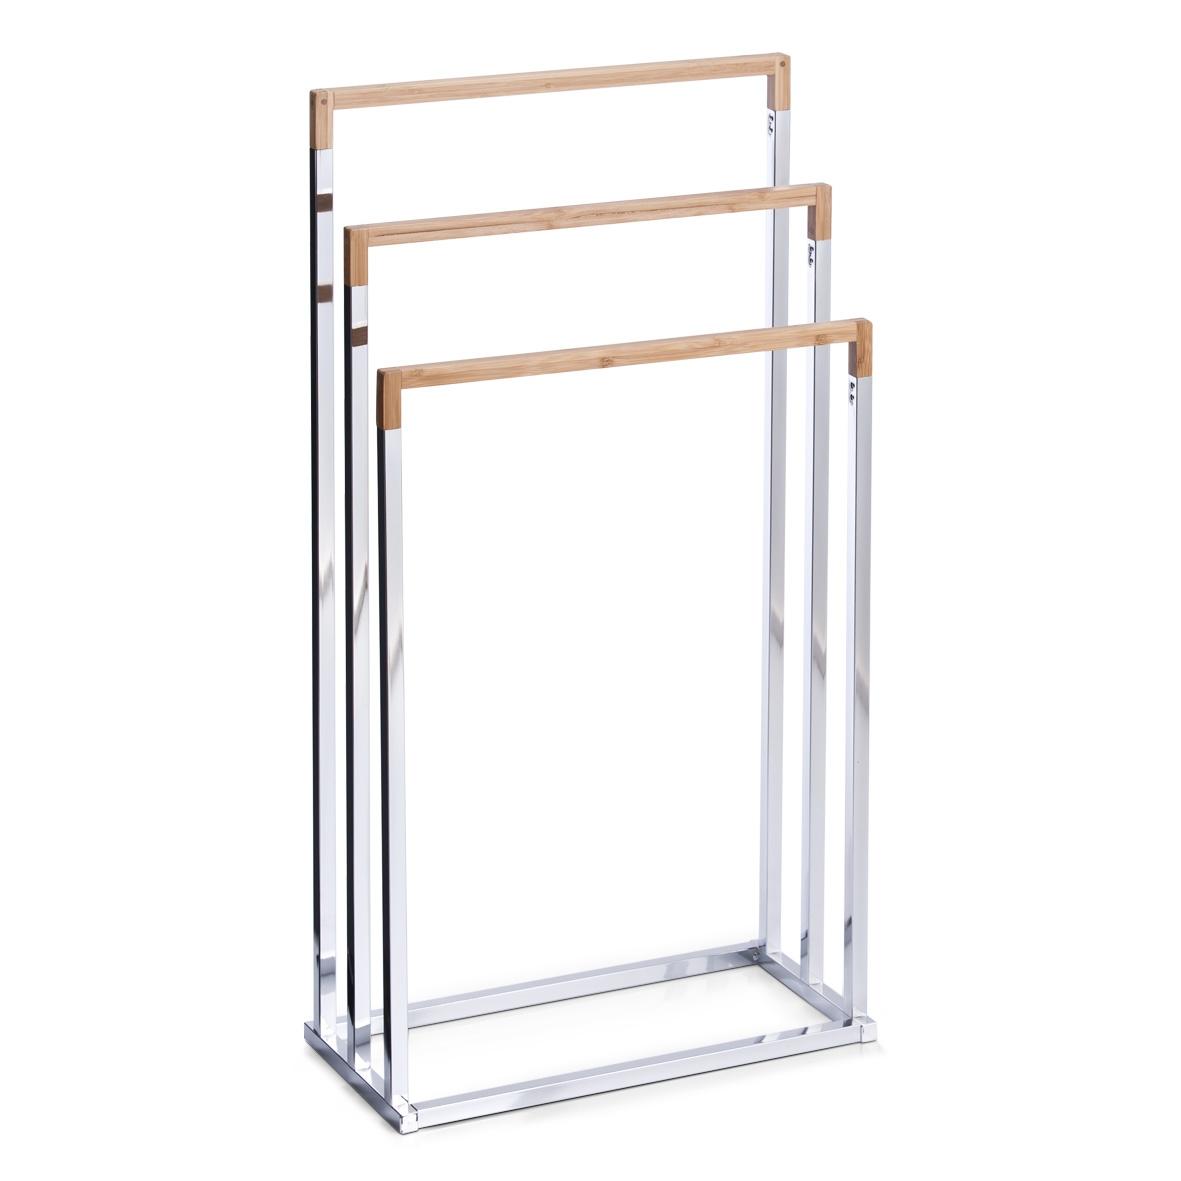 Suport pentru prosoape de baie, Bamboo Metal Cromat, l45xA21,5xH84,5 cm